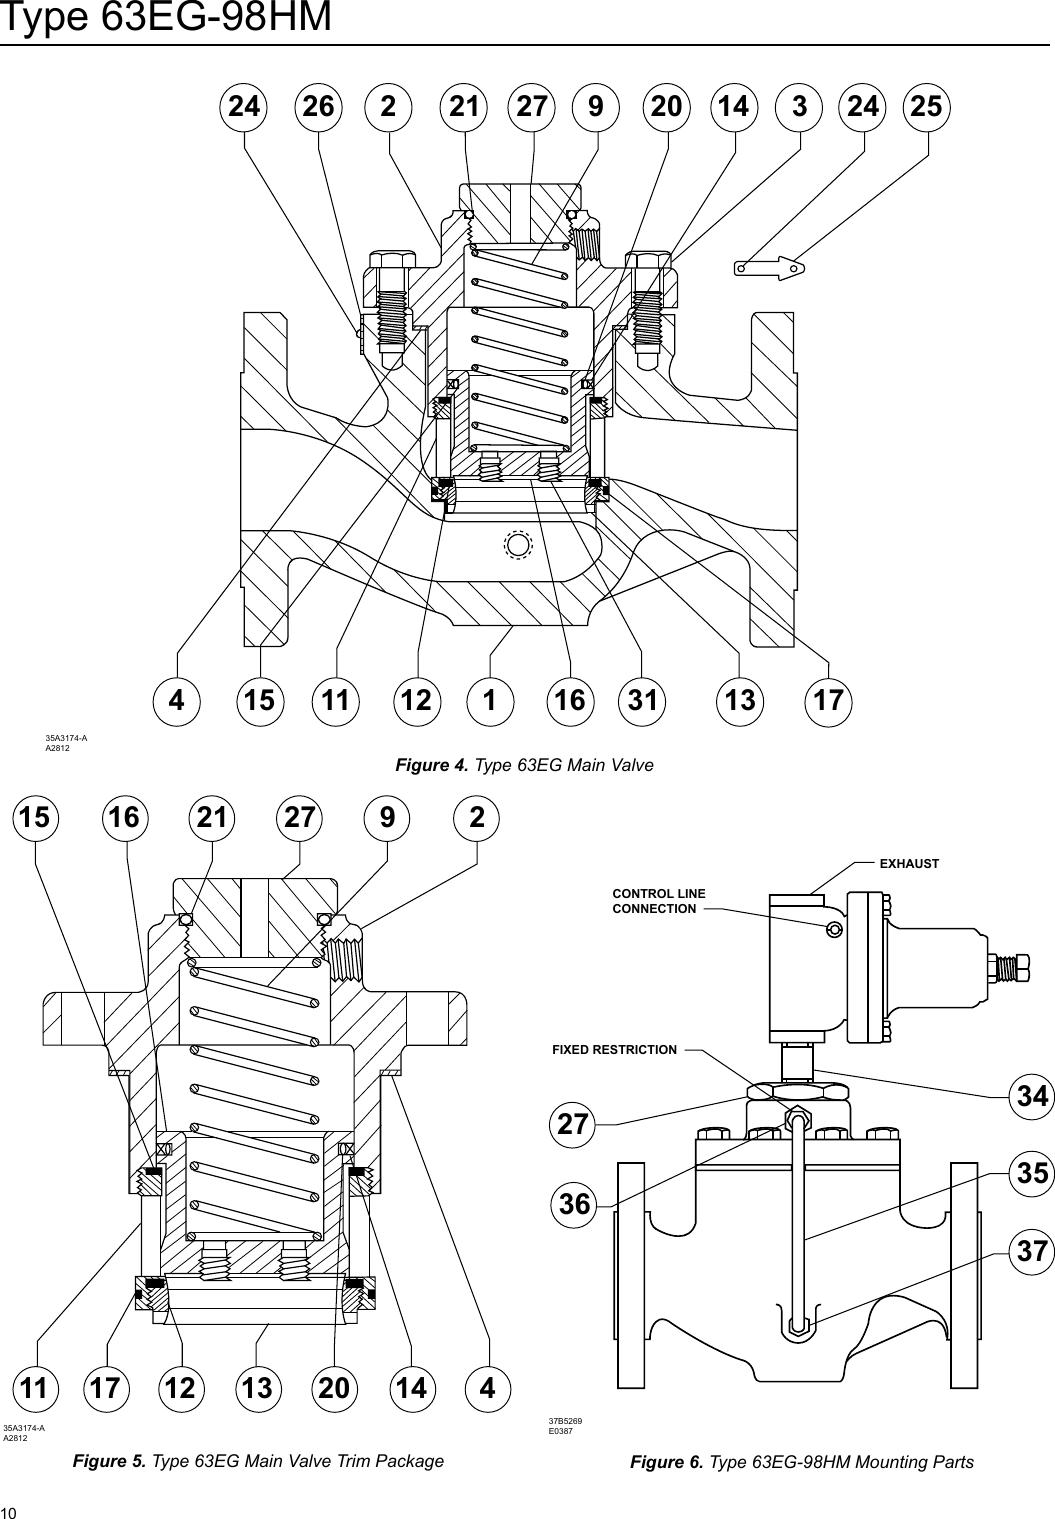 Emerson Type 63eg 98hm Pilot Operated Relief Valve Or Backpressure Regulator Instruction Manual